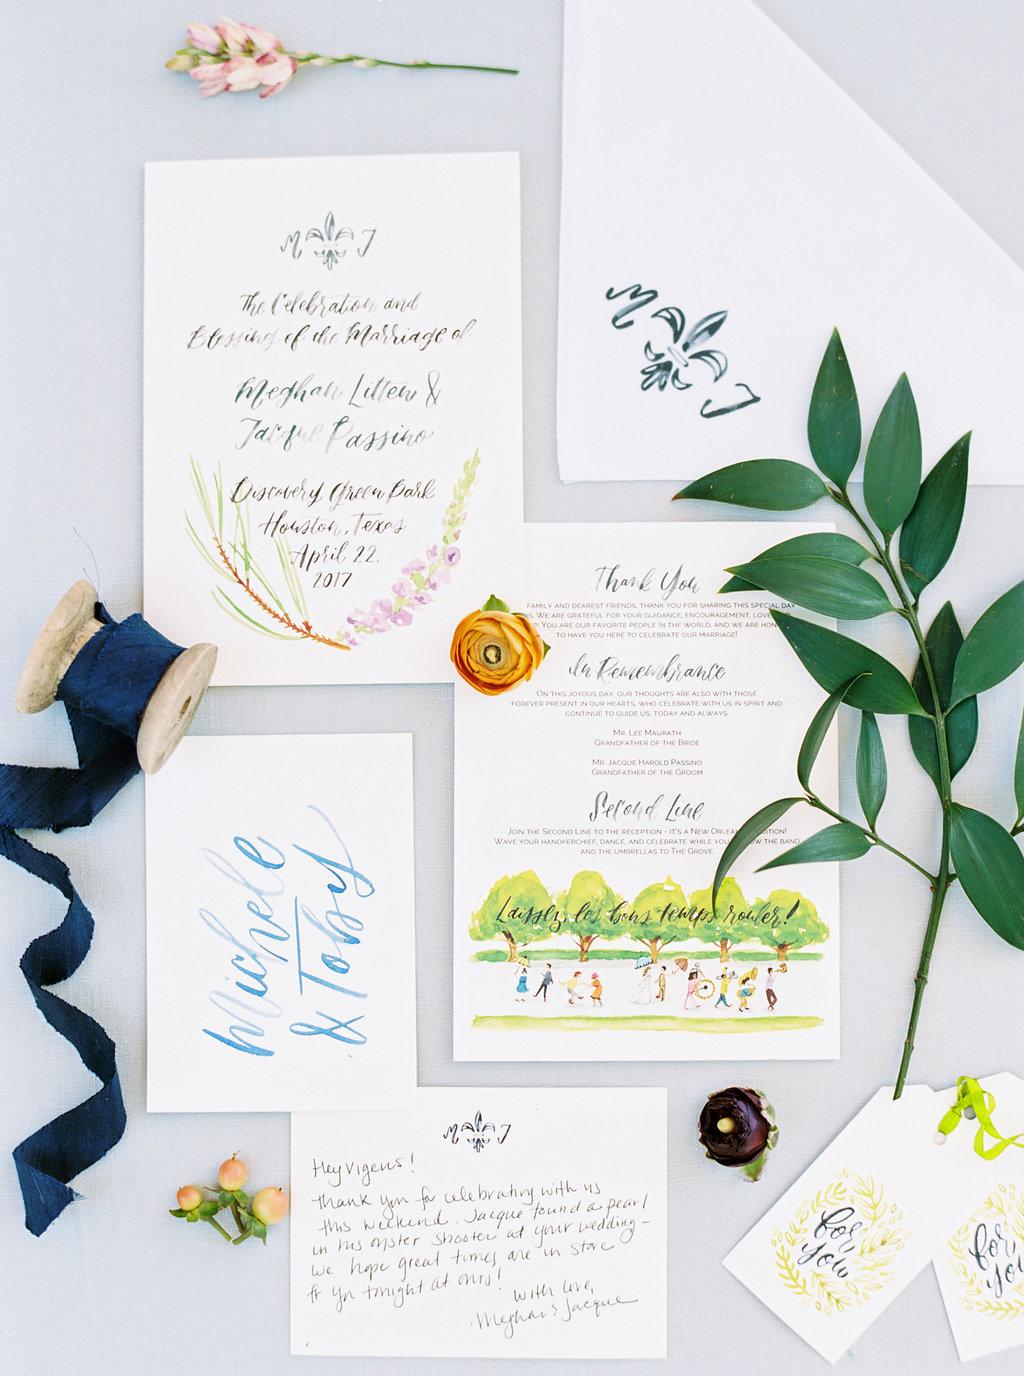 wedding second line illustration in program